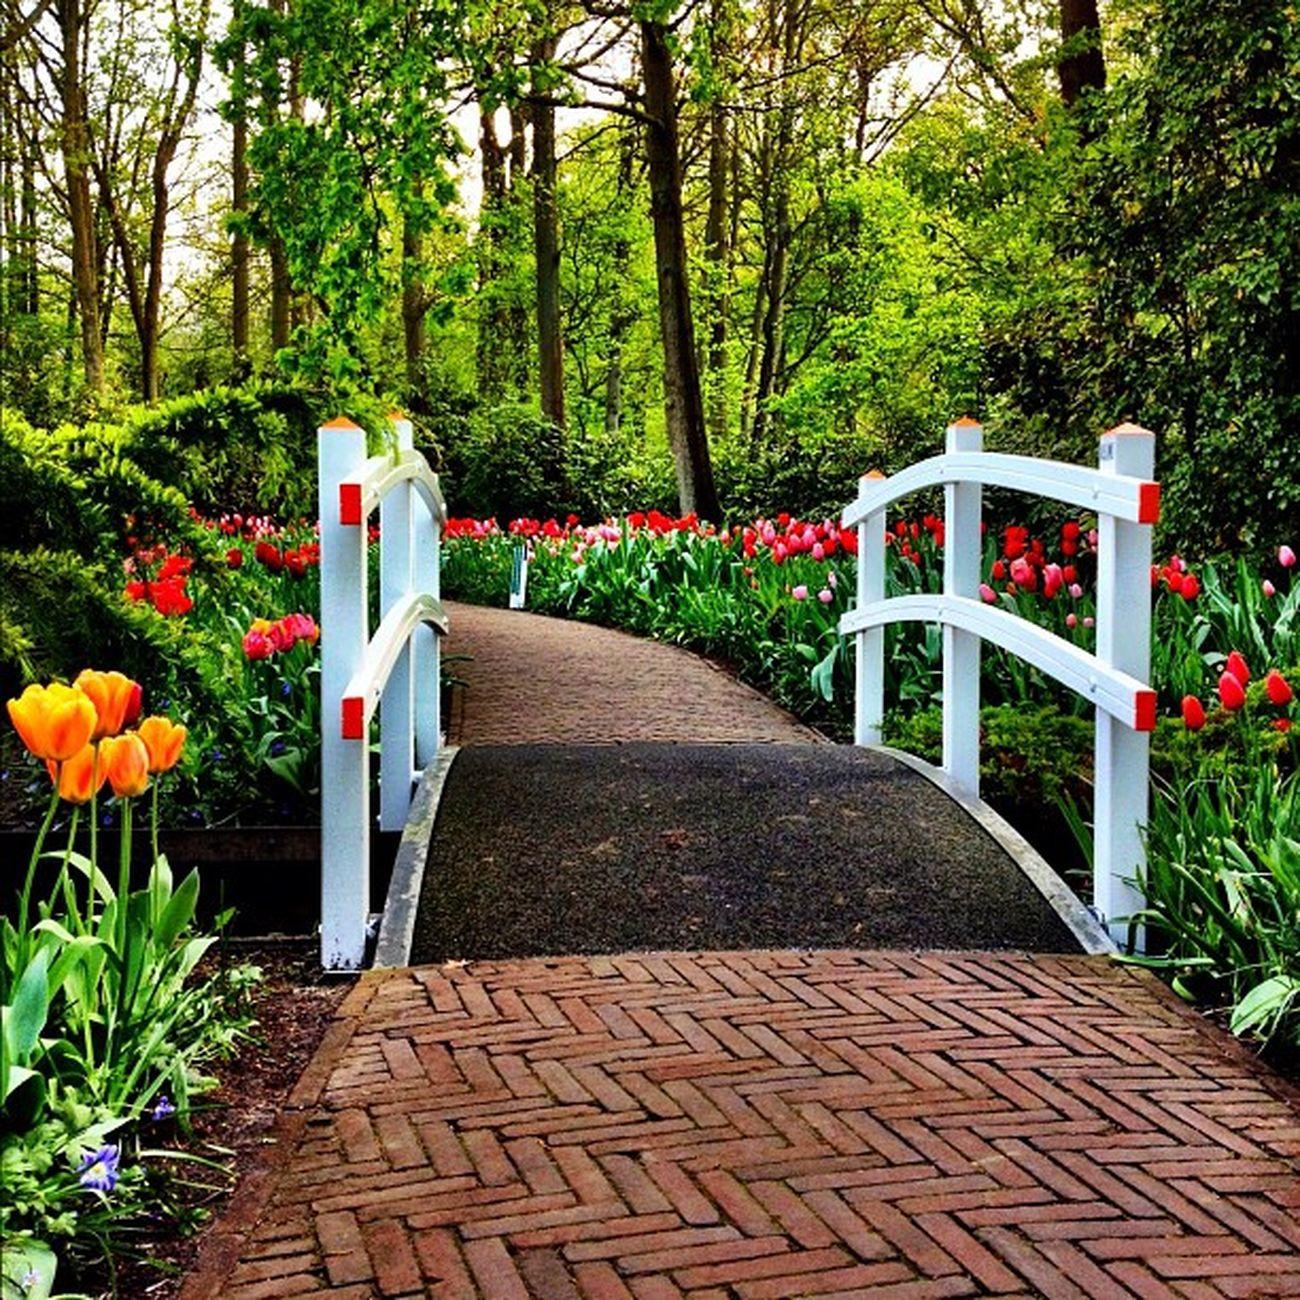 Bridge #tulipfieldsexperience #holland #igersholland #dutch #jj_forum #flower #keukenhof #ubiquography #tulip #jj Tulipfieldsexperience Flower Holland Tulip Dutch Jj  Keukenhof Jj_forum Ubiquography Igersholland Theflowerofgardens